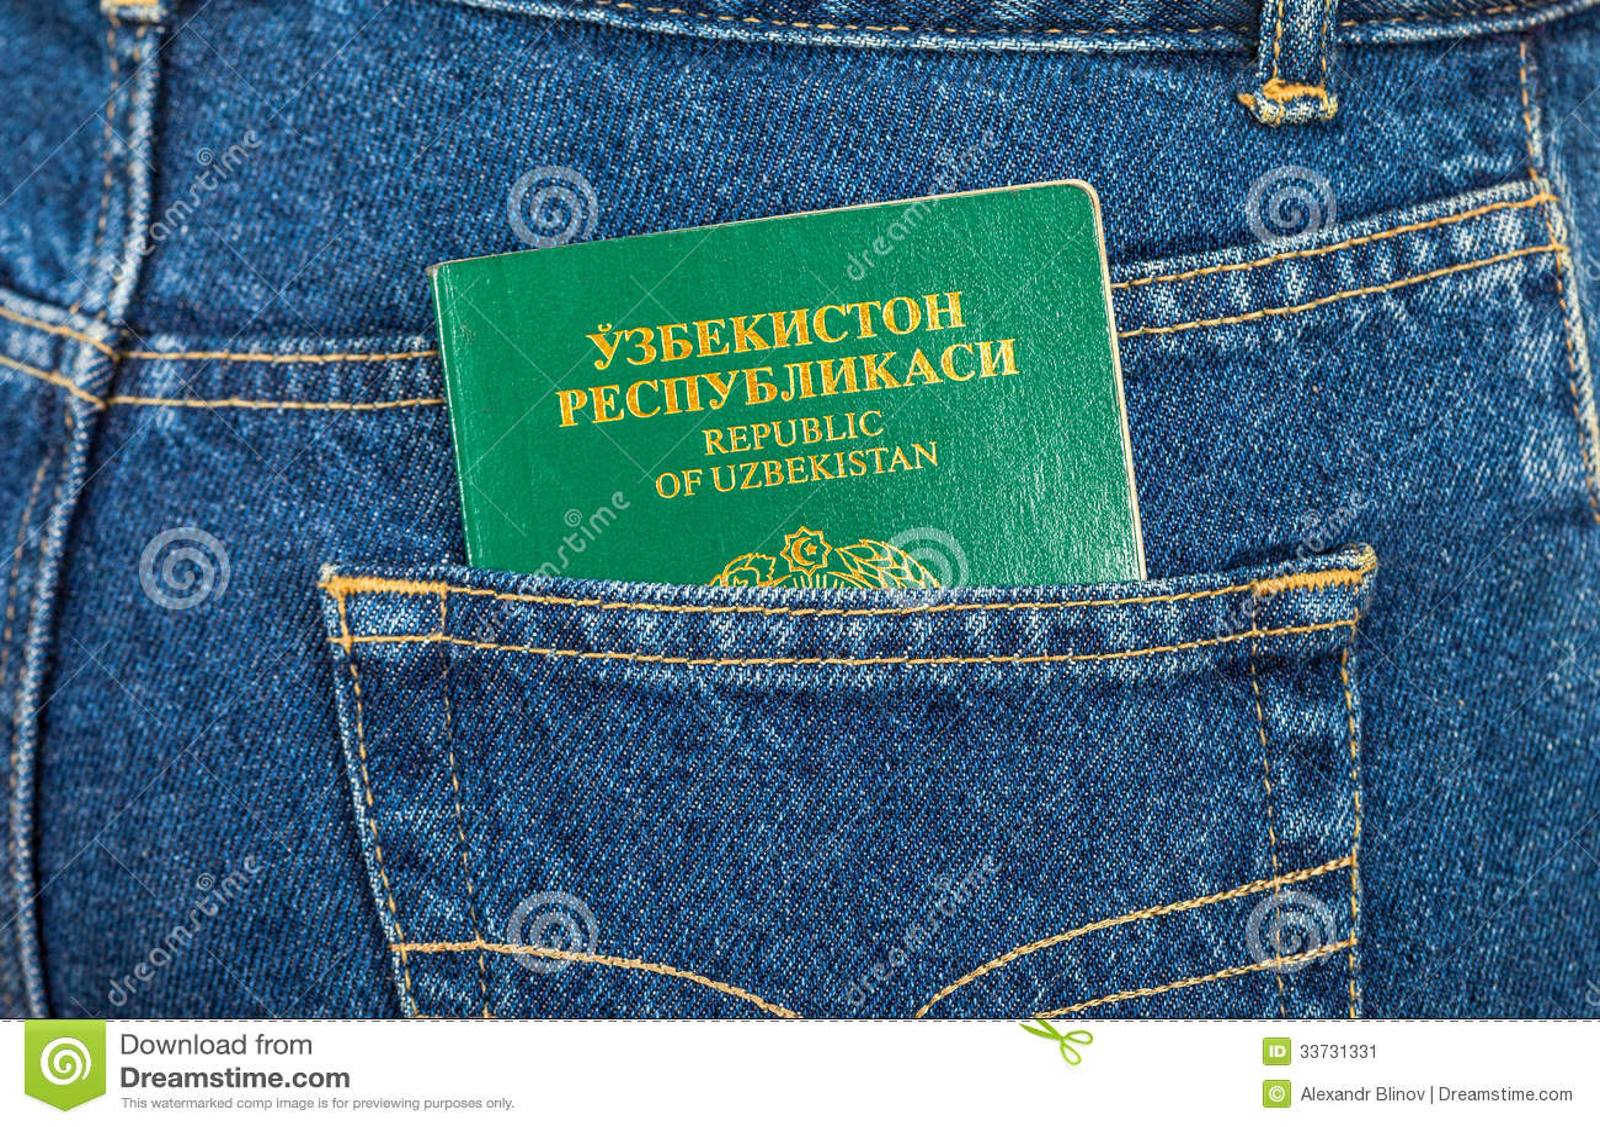 Пасспорт Узбекистана в карманн джинсов